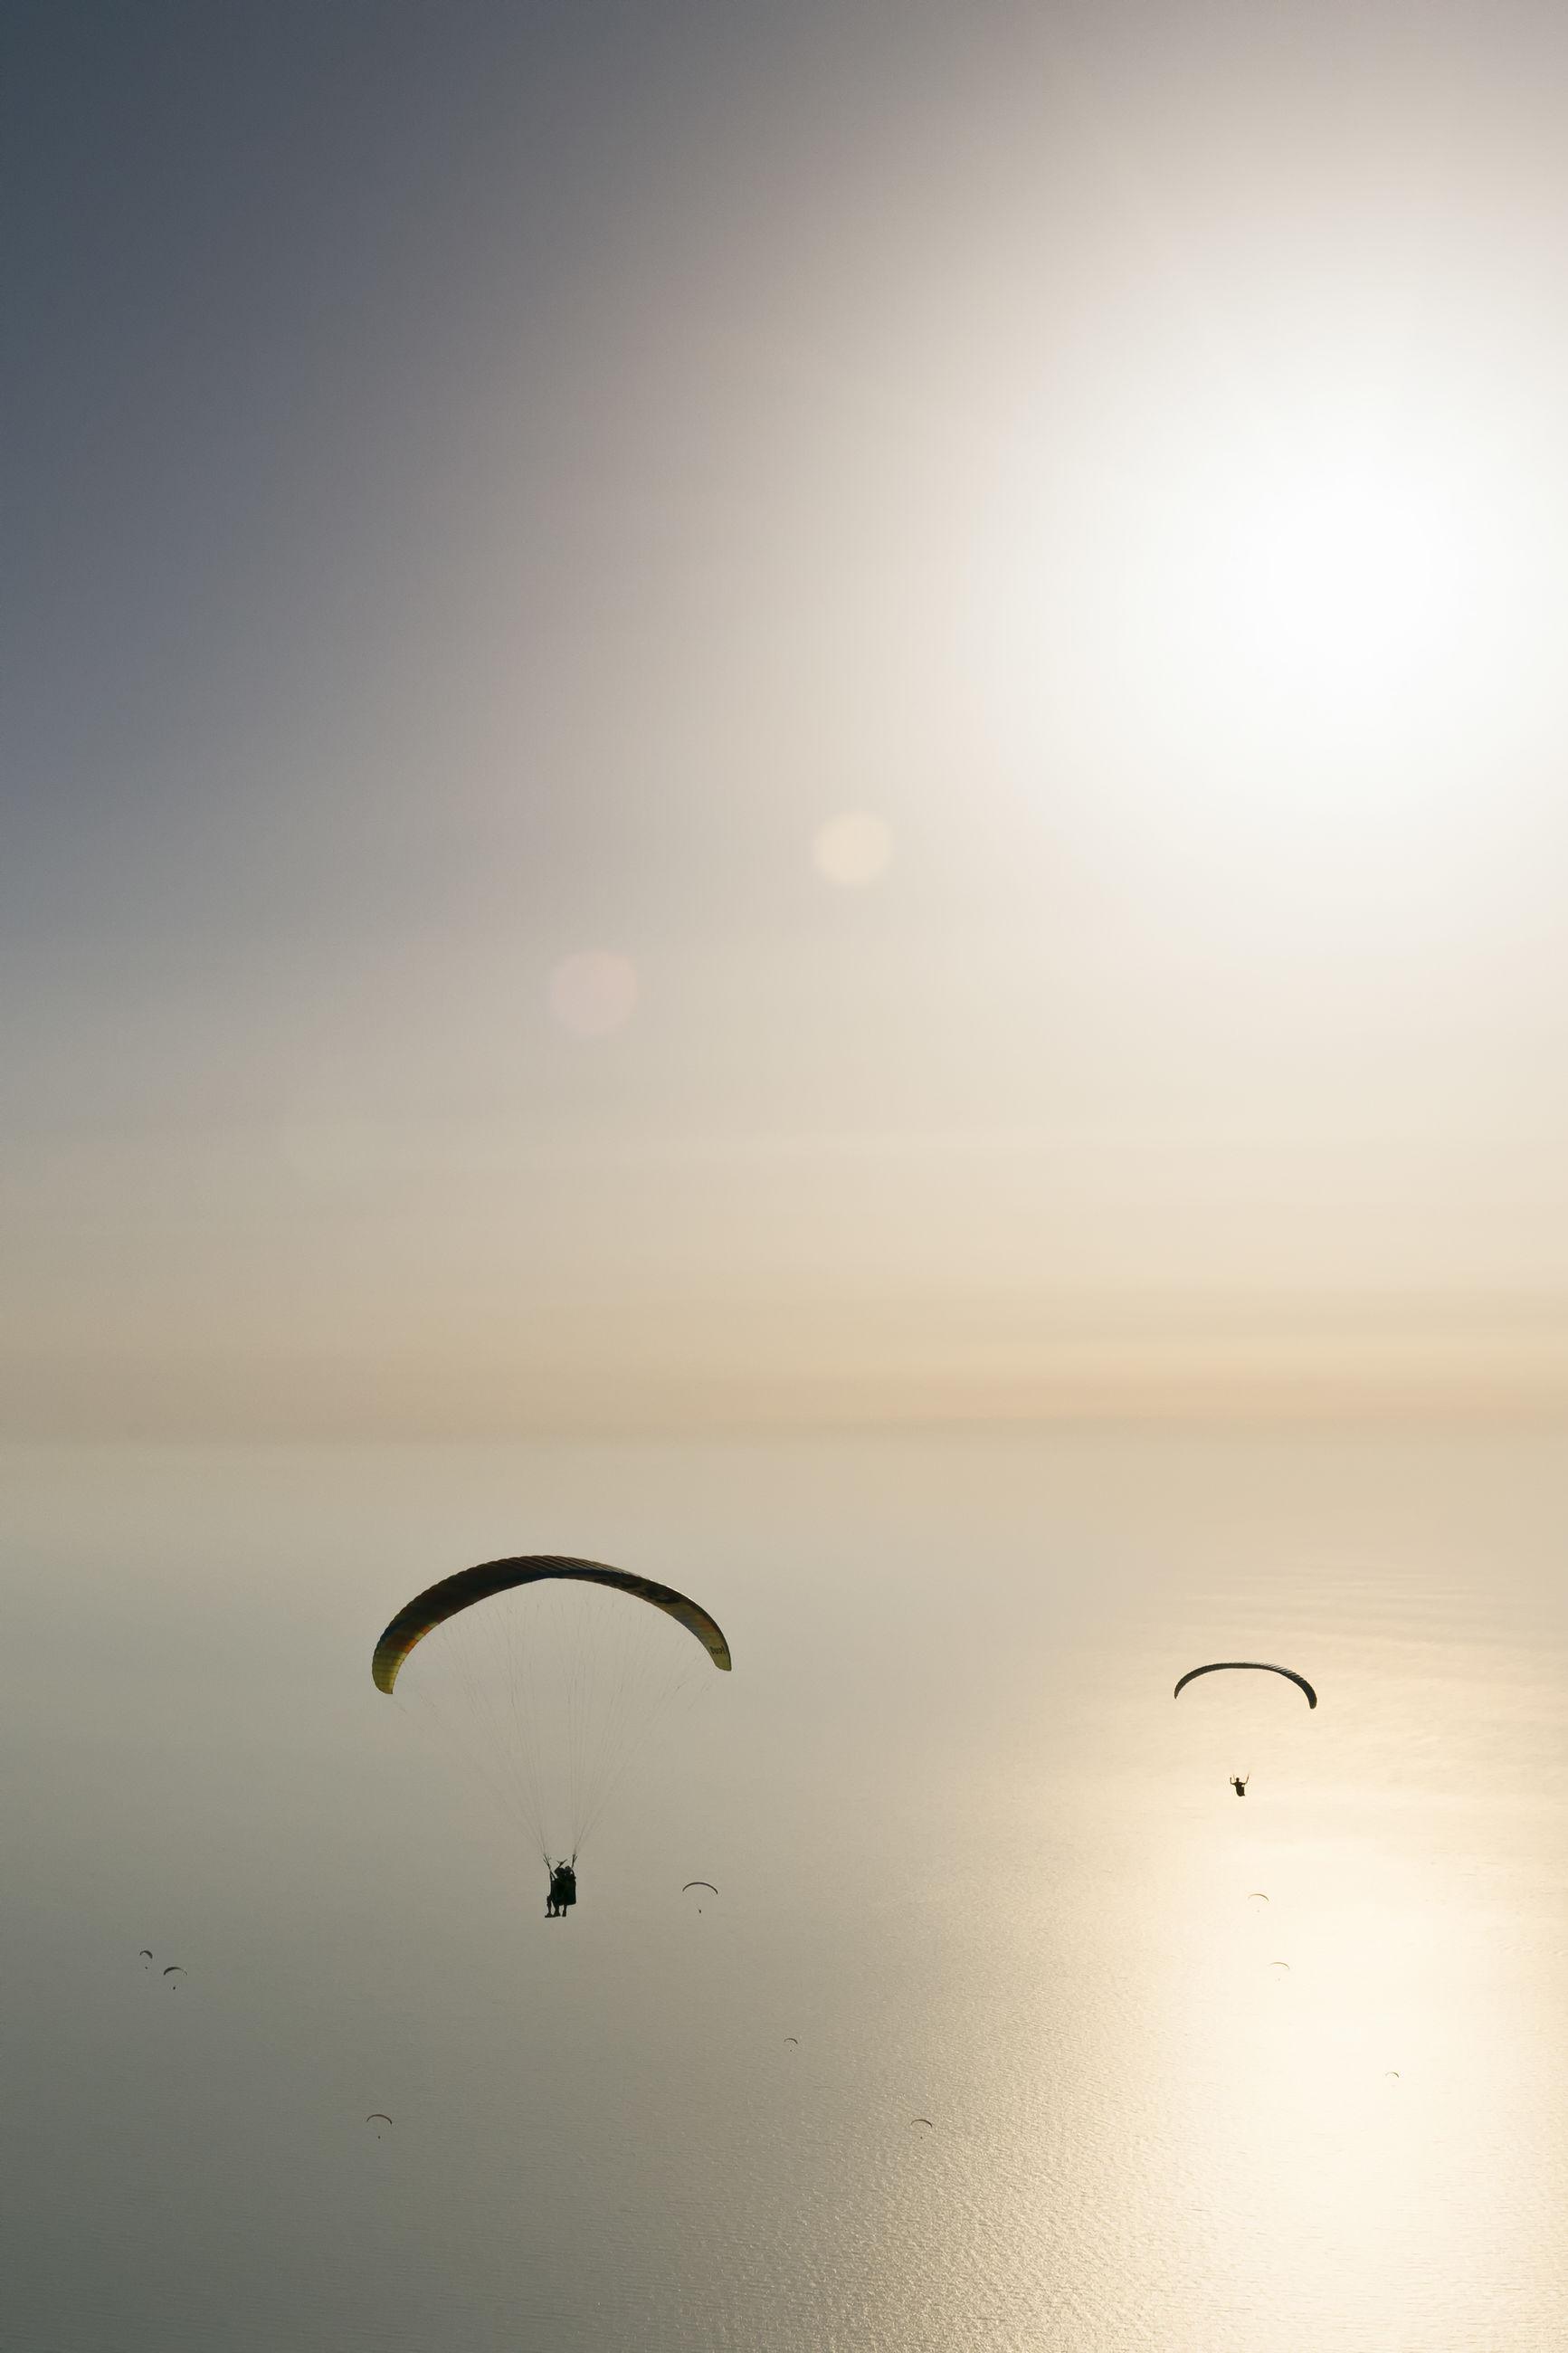 SILHOUETTE OF KITE FLYING OVER SEA AGAINST SKY